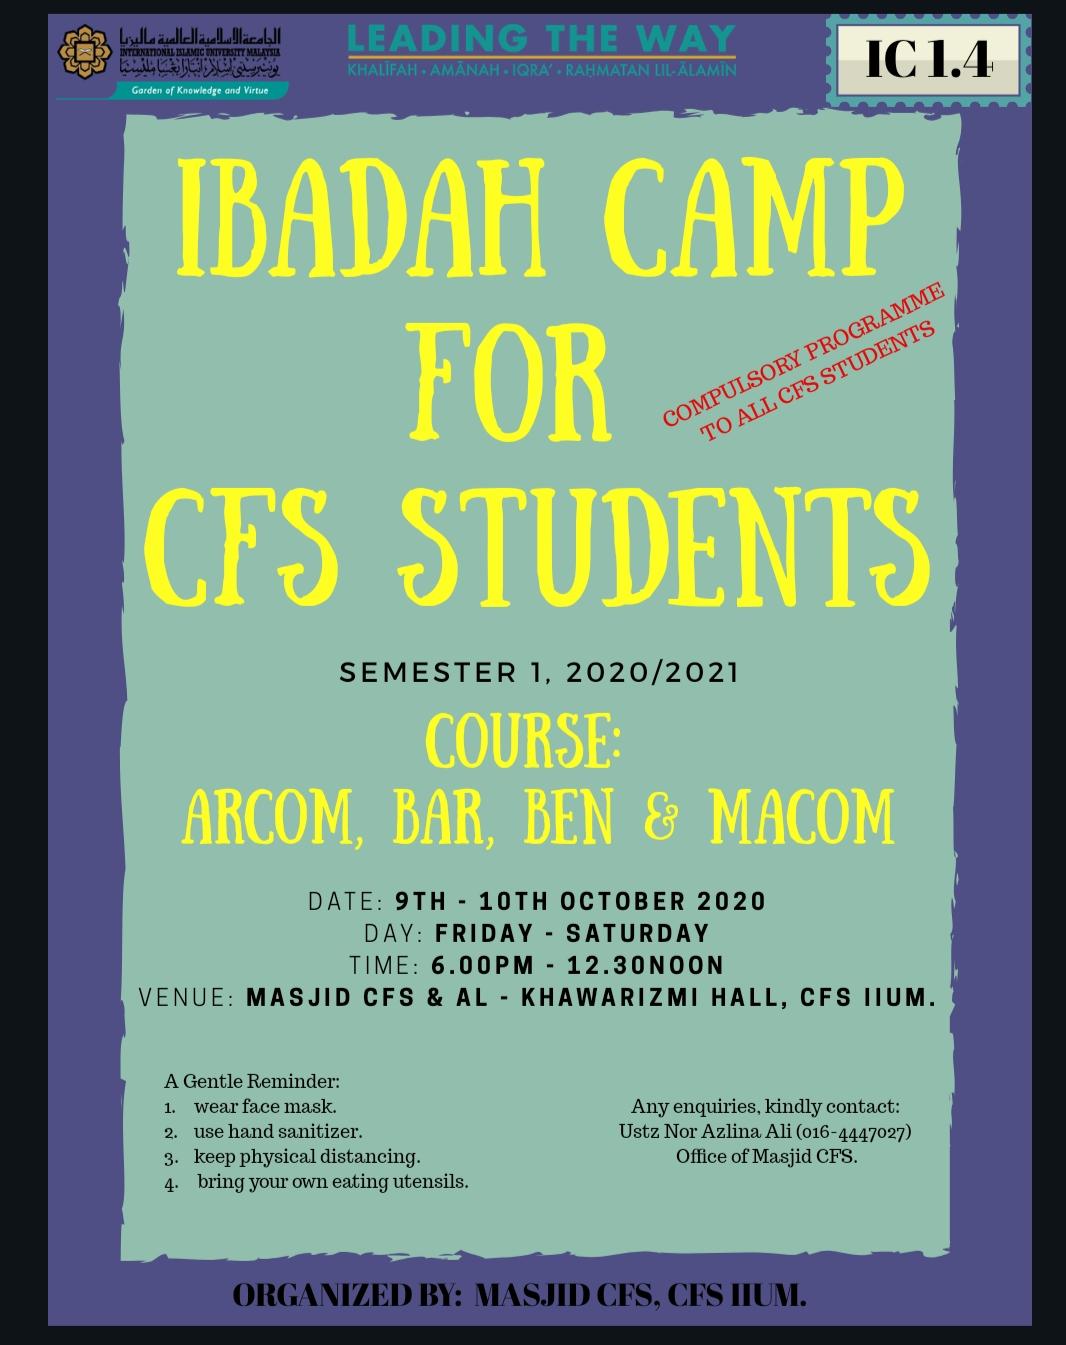 IBADAH CAMP FOR CFS STUDENTS (ARCOM, BAR, BEN & MACOM)